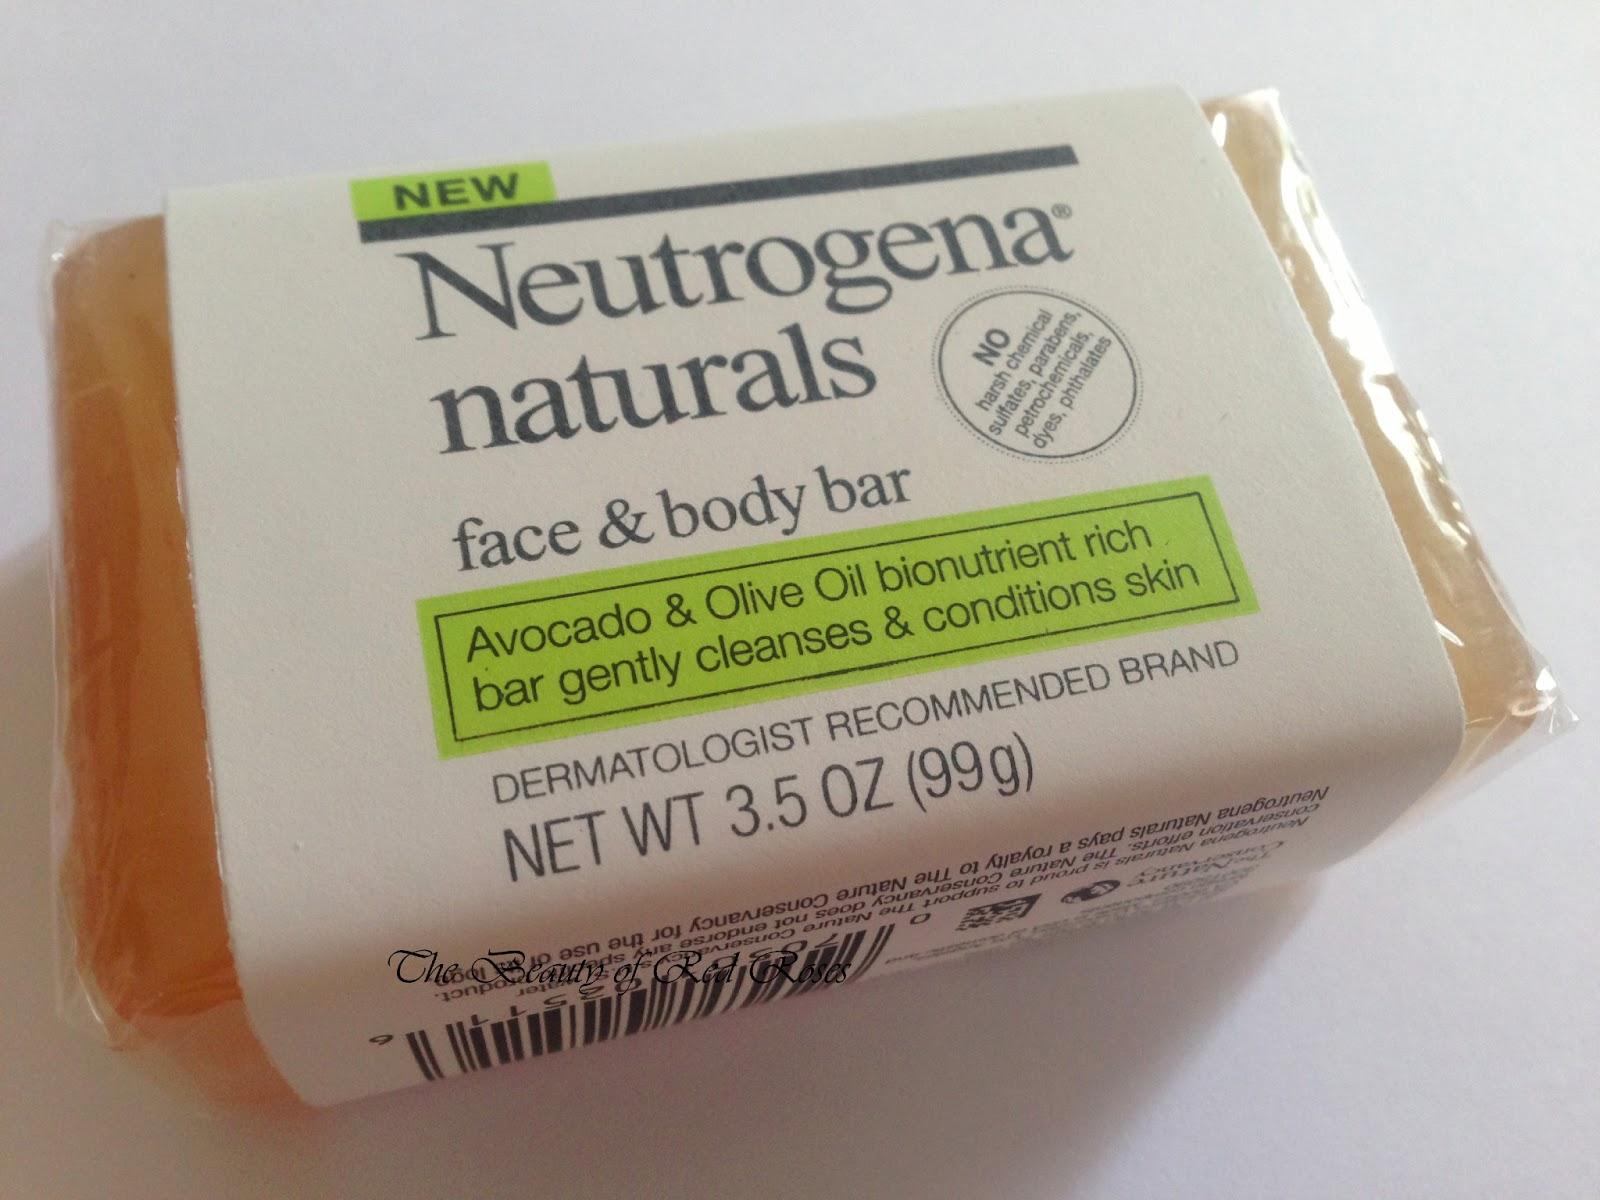 facial bar ingredients Neutrogena